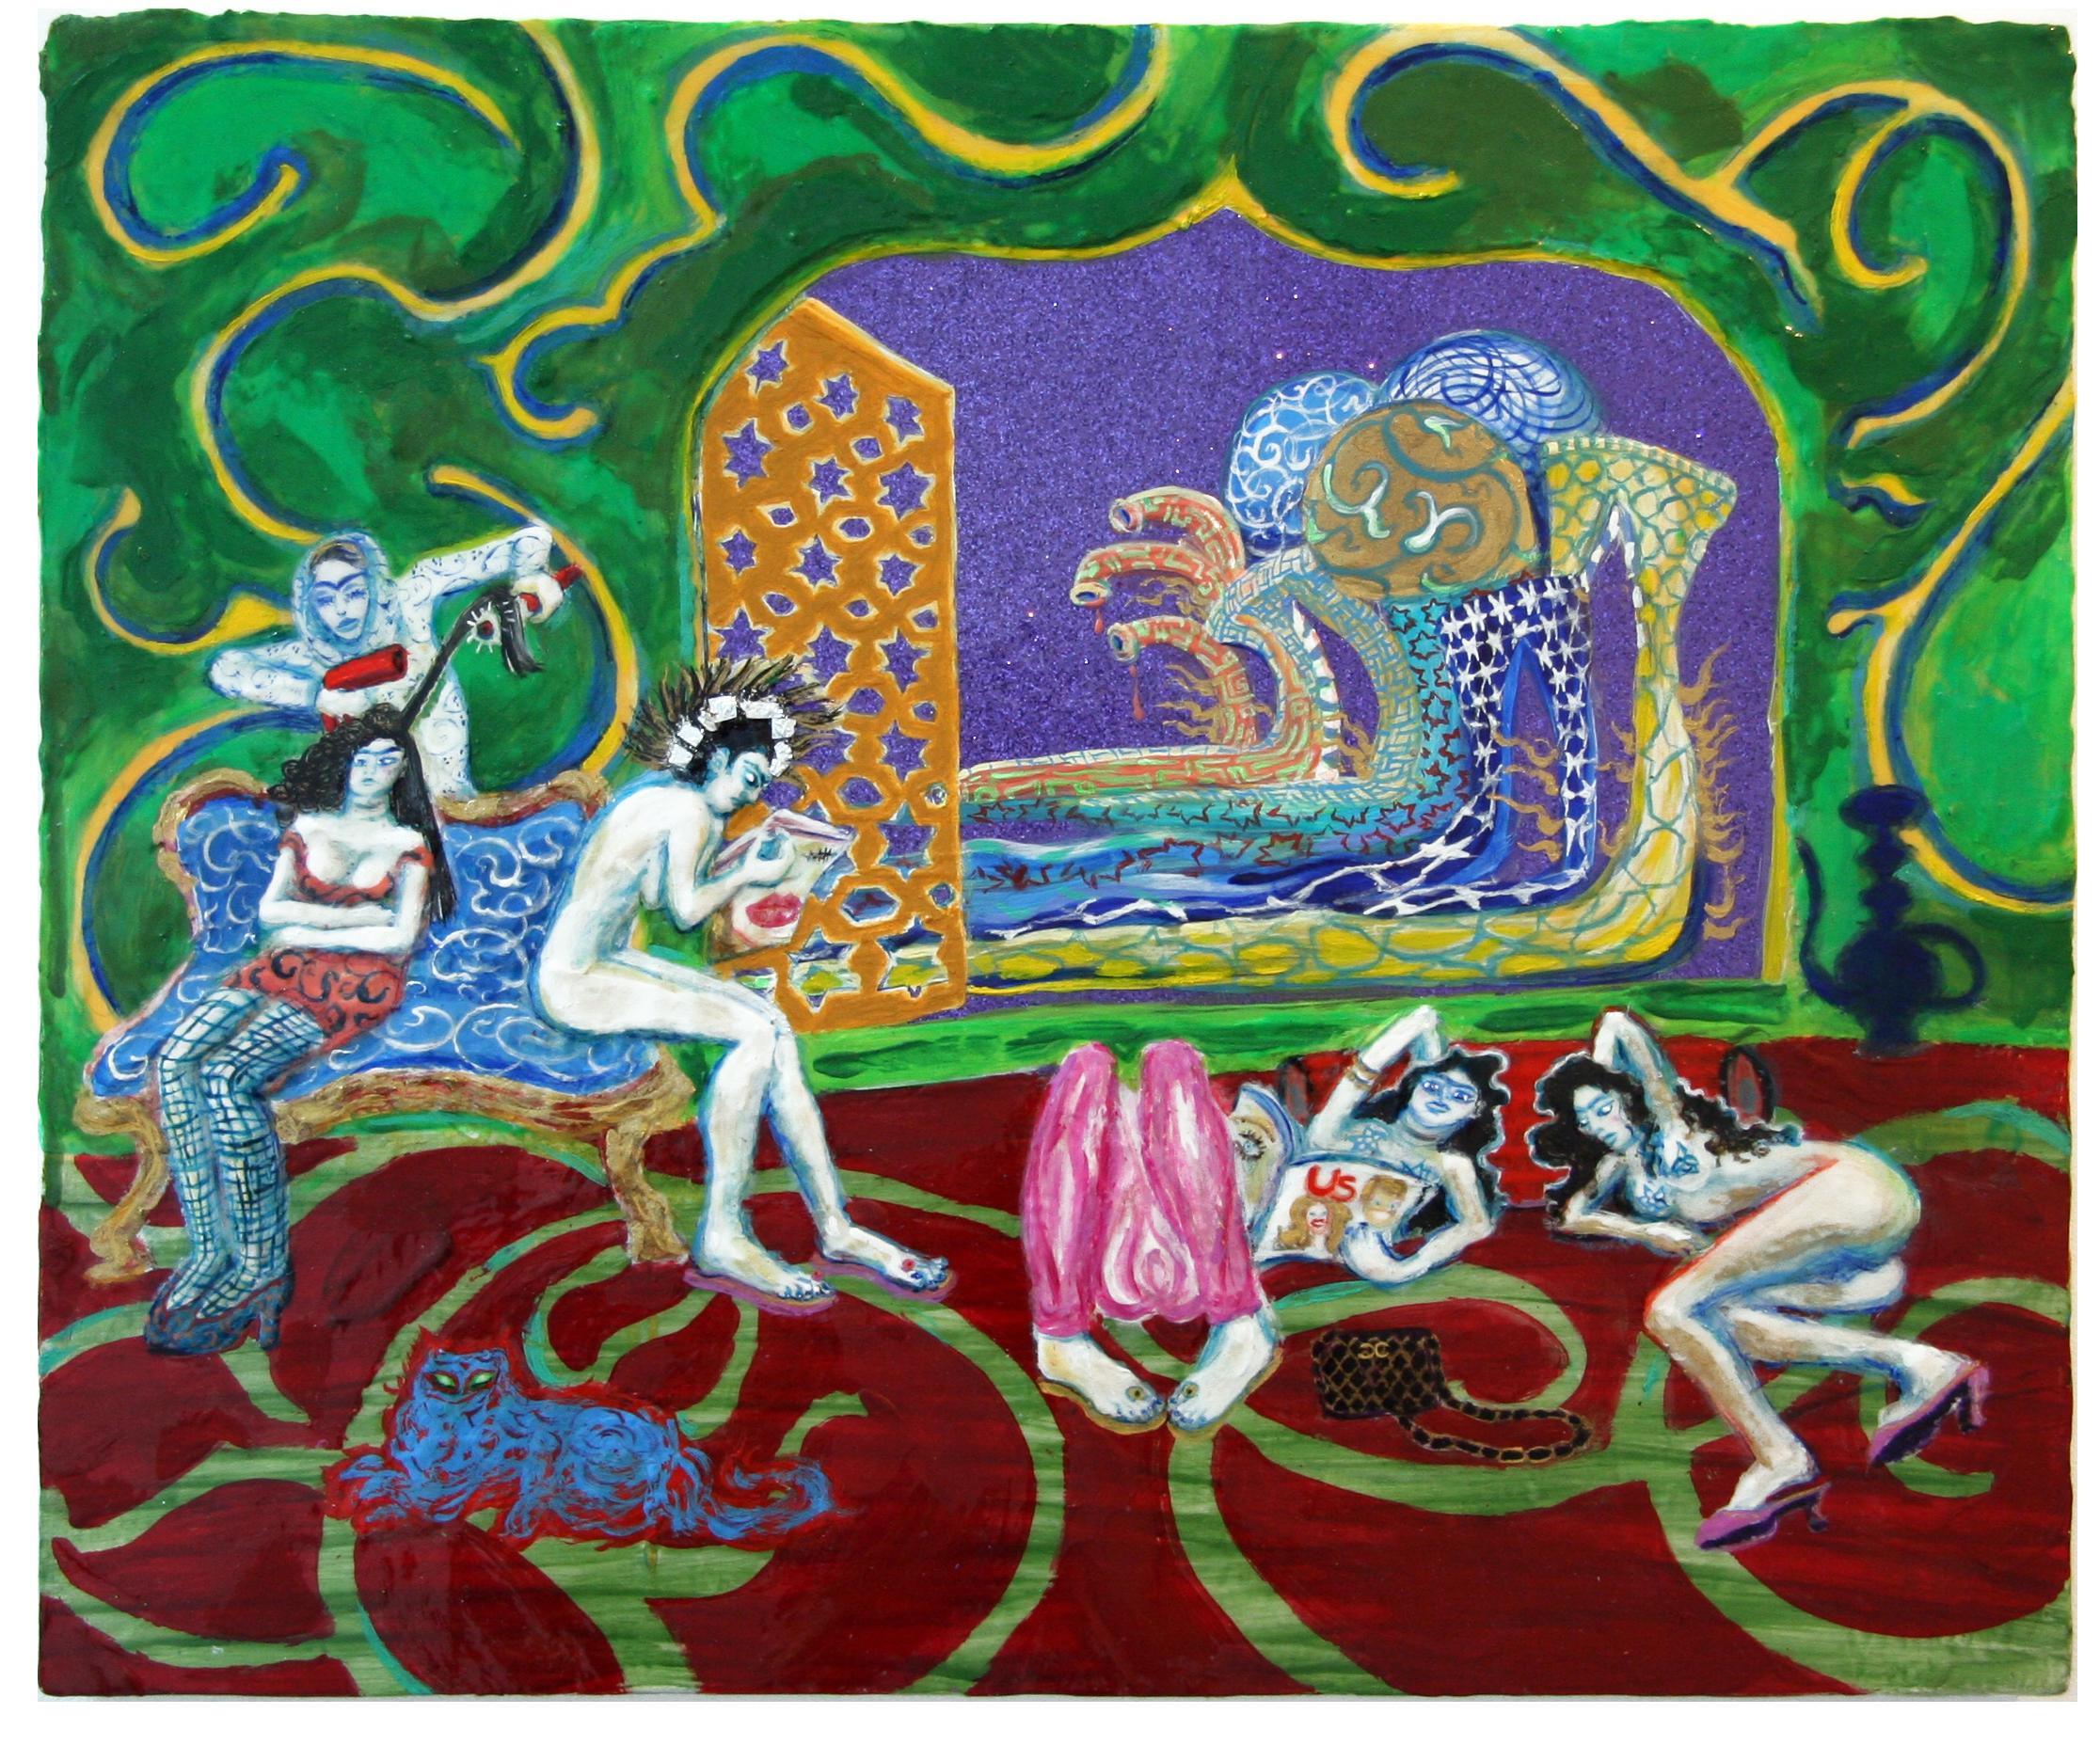 The Persian Vase, 2008, Mixed media on panel